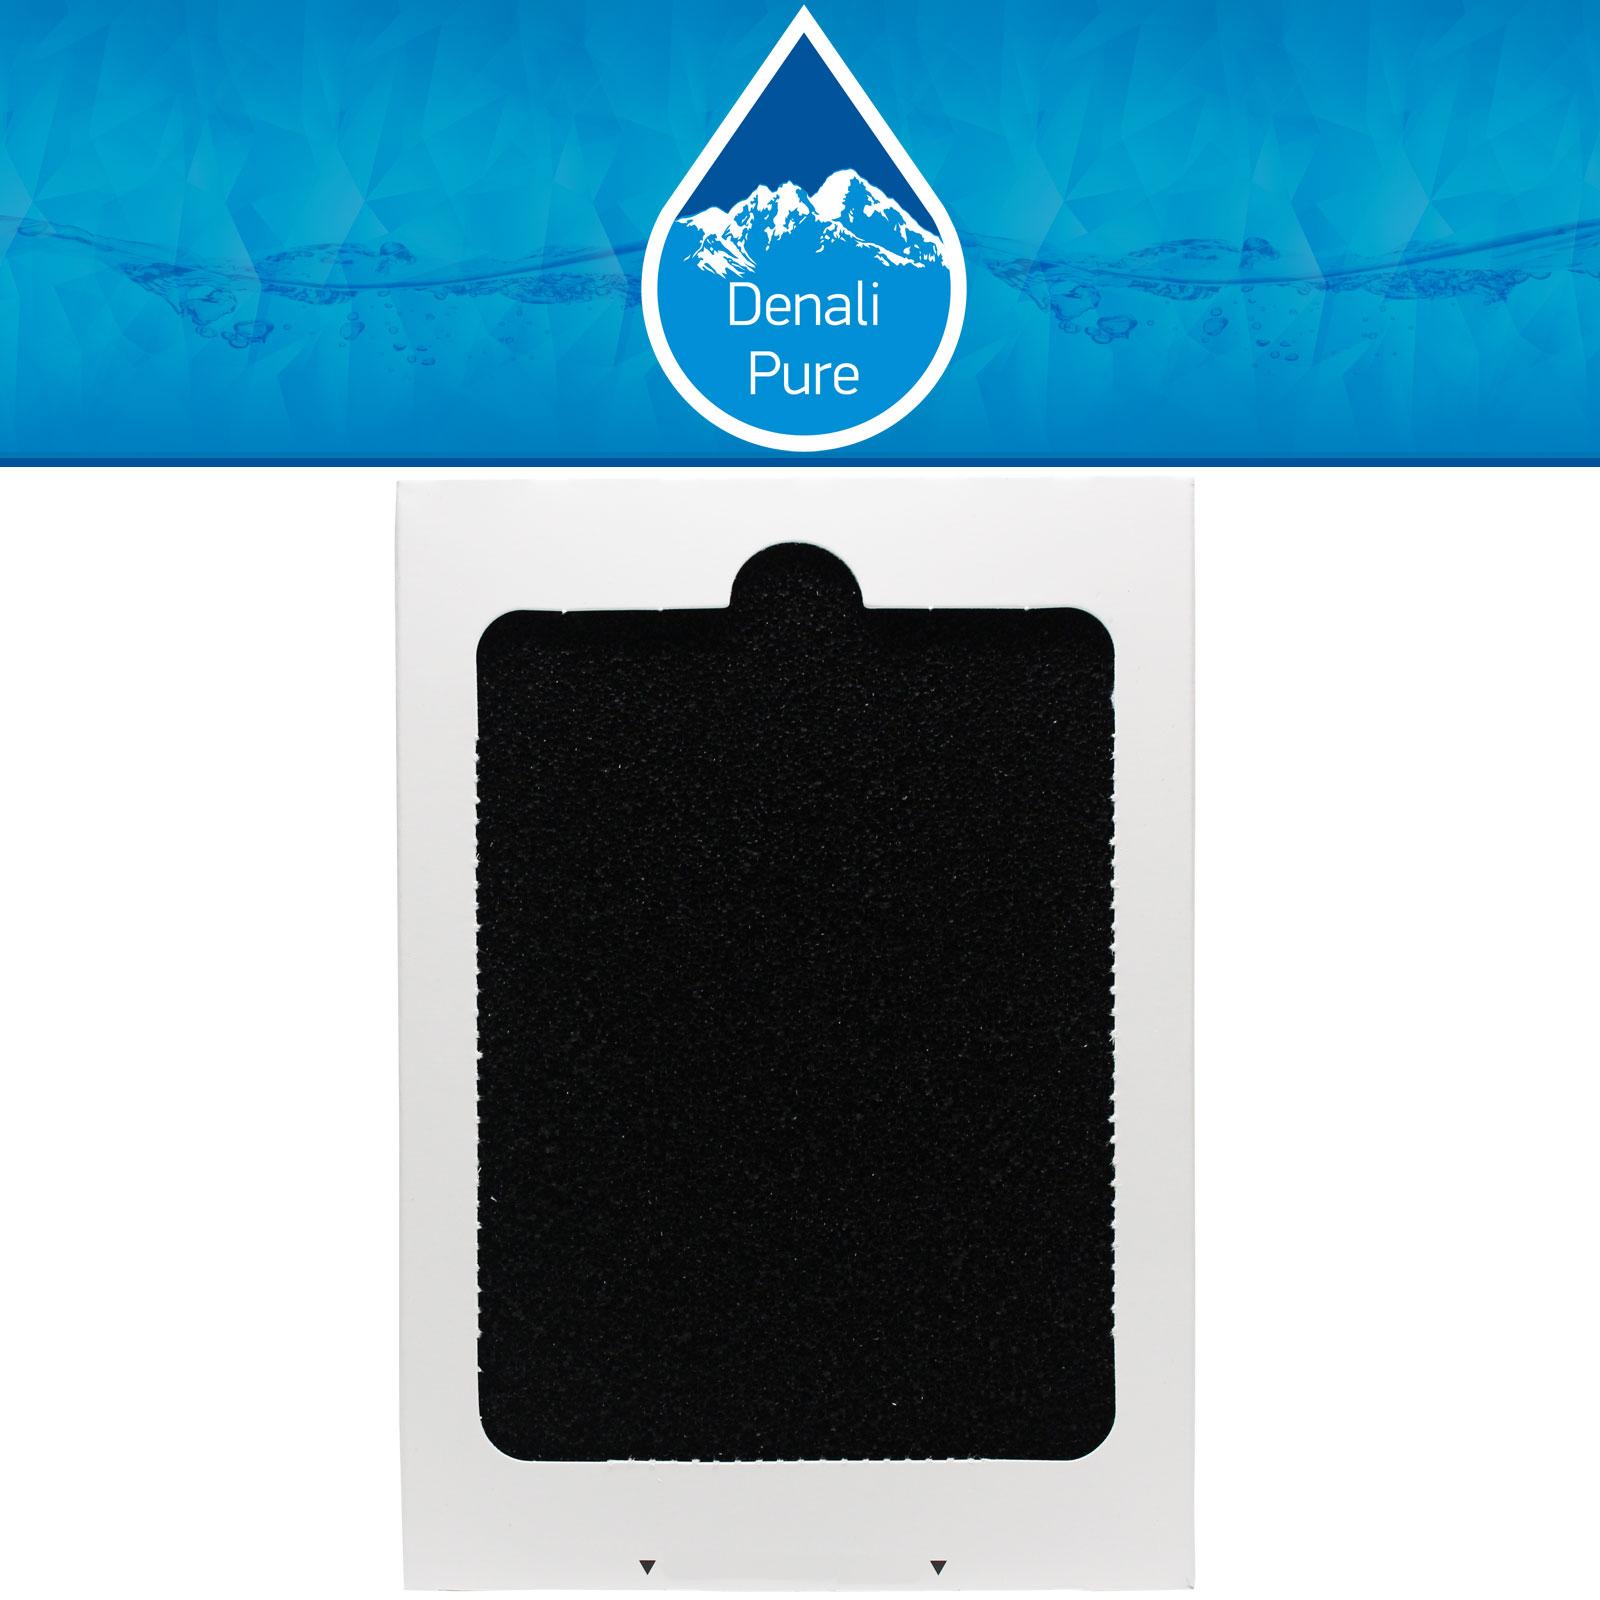 8 Pack Air Filter for Electrolux E23BC68JPS0 E23BC68JPS3 E23BC68JSS1 E23BC78IPS1